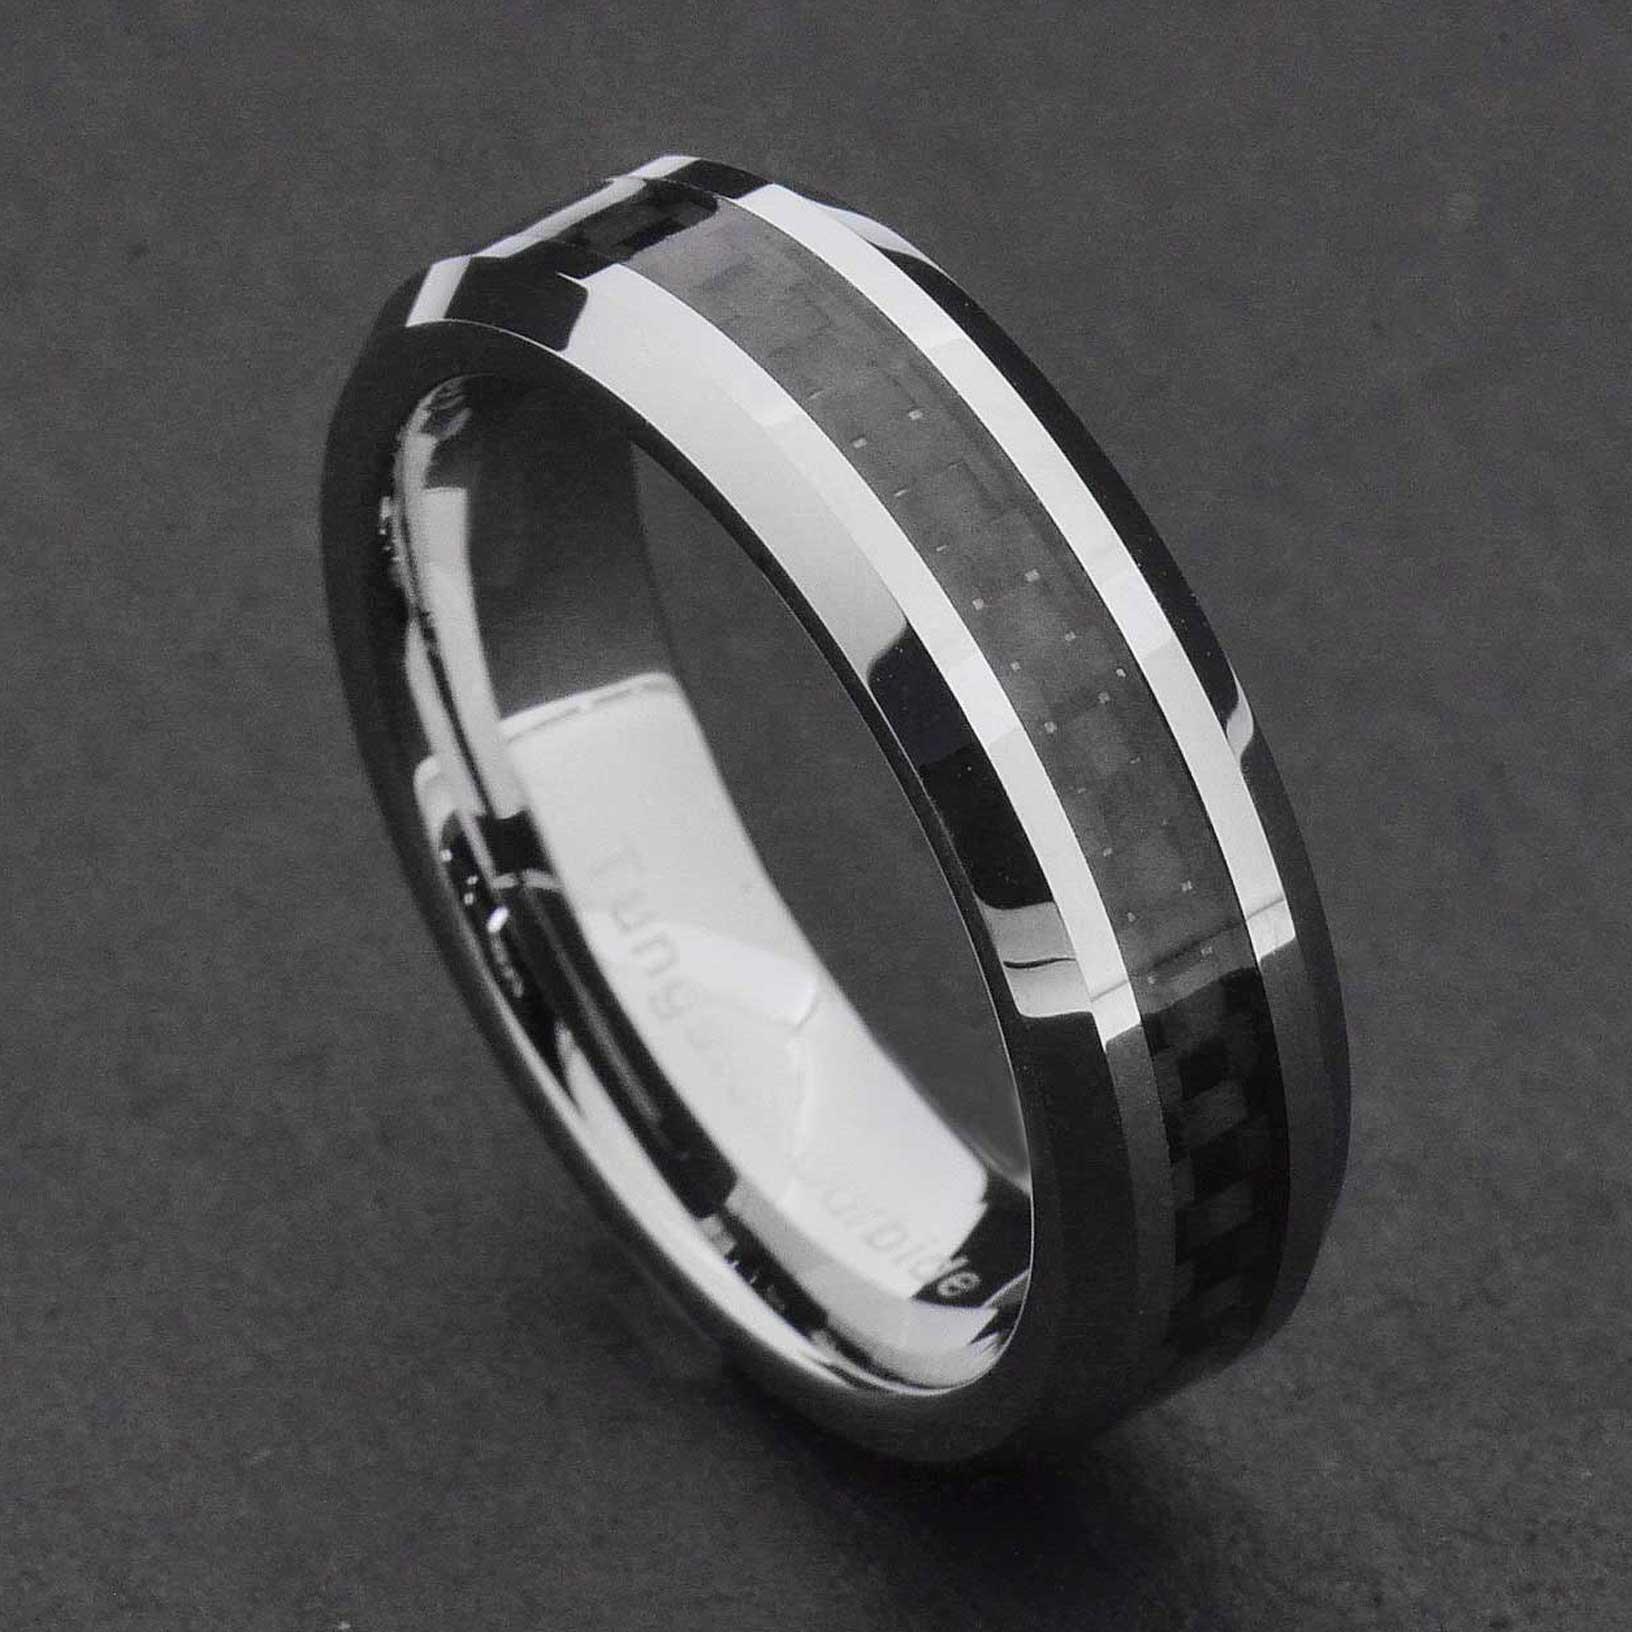 Blackened Bands: 6mm Tungsten Carbide Black Carbon Fiber Women's Wedding